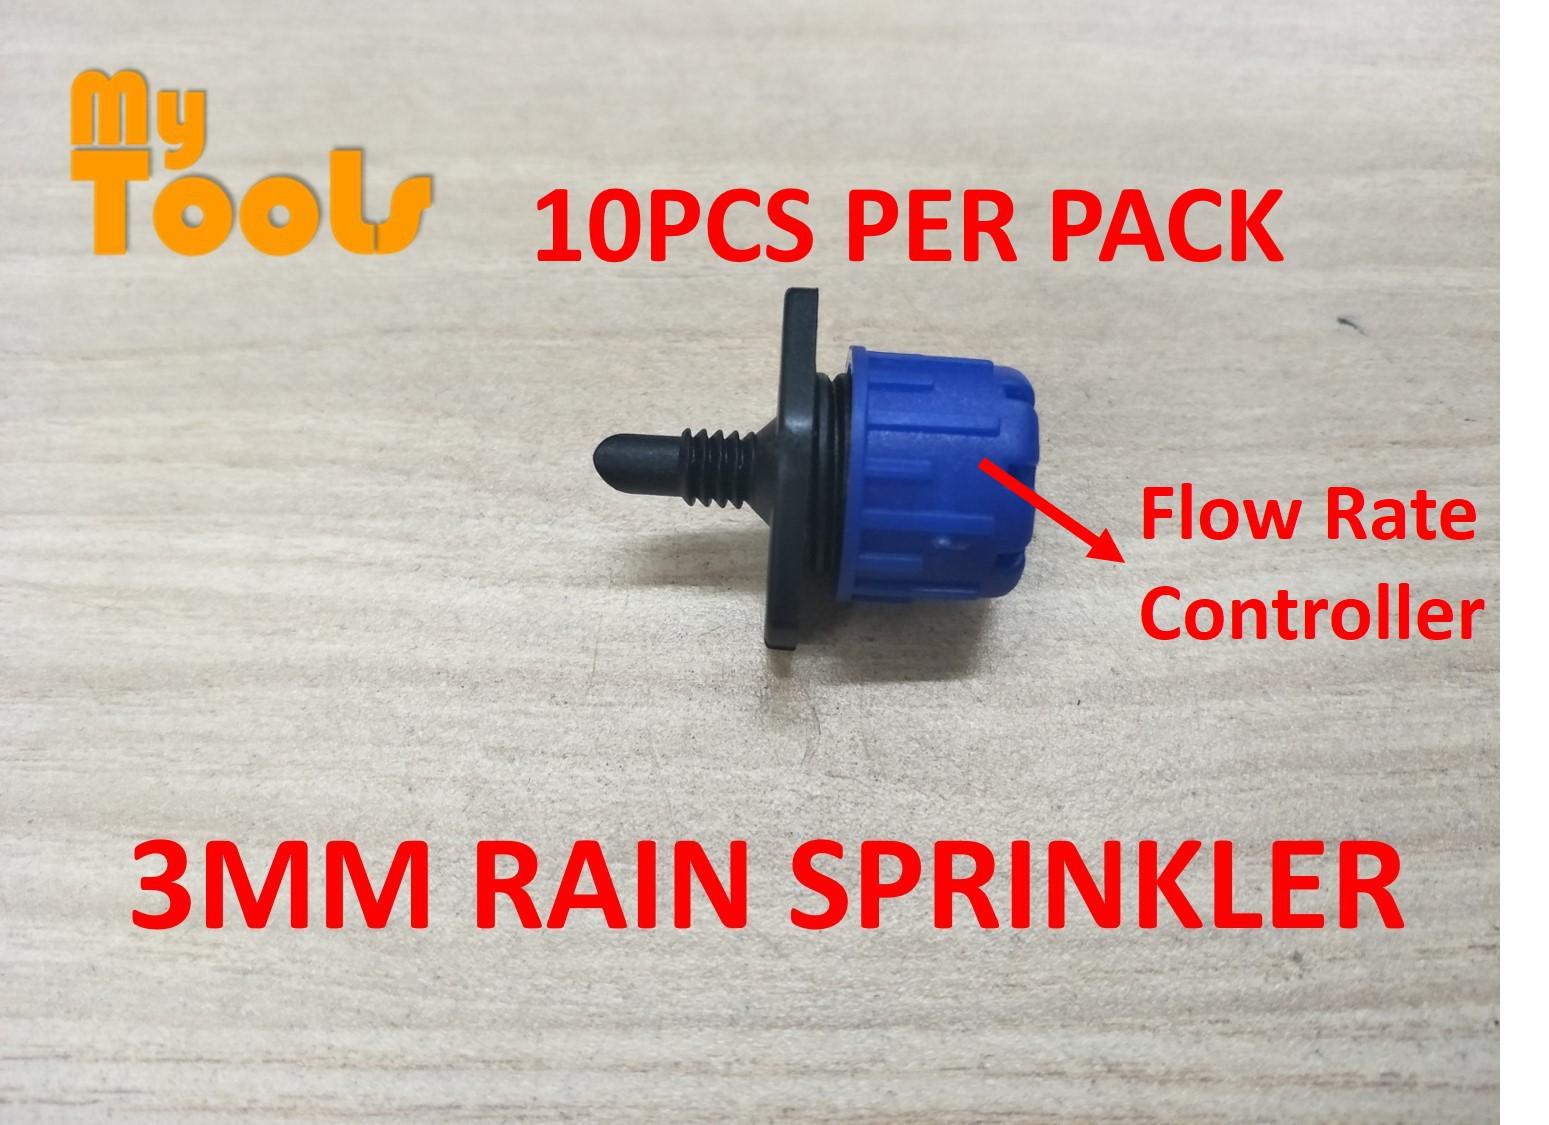 Mytools Mini Jet Sprinkler Rain Sprayer Nozzle Garden Watering Pipe Fitting Connector Fertigasi 16mm 20mm Poly Tubing